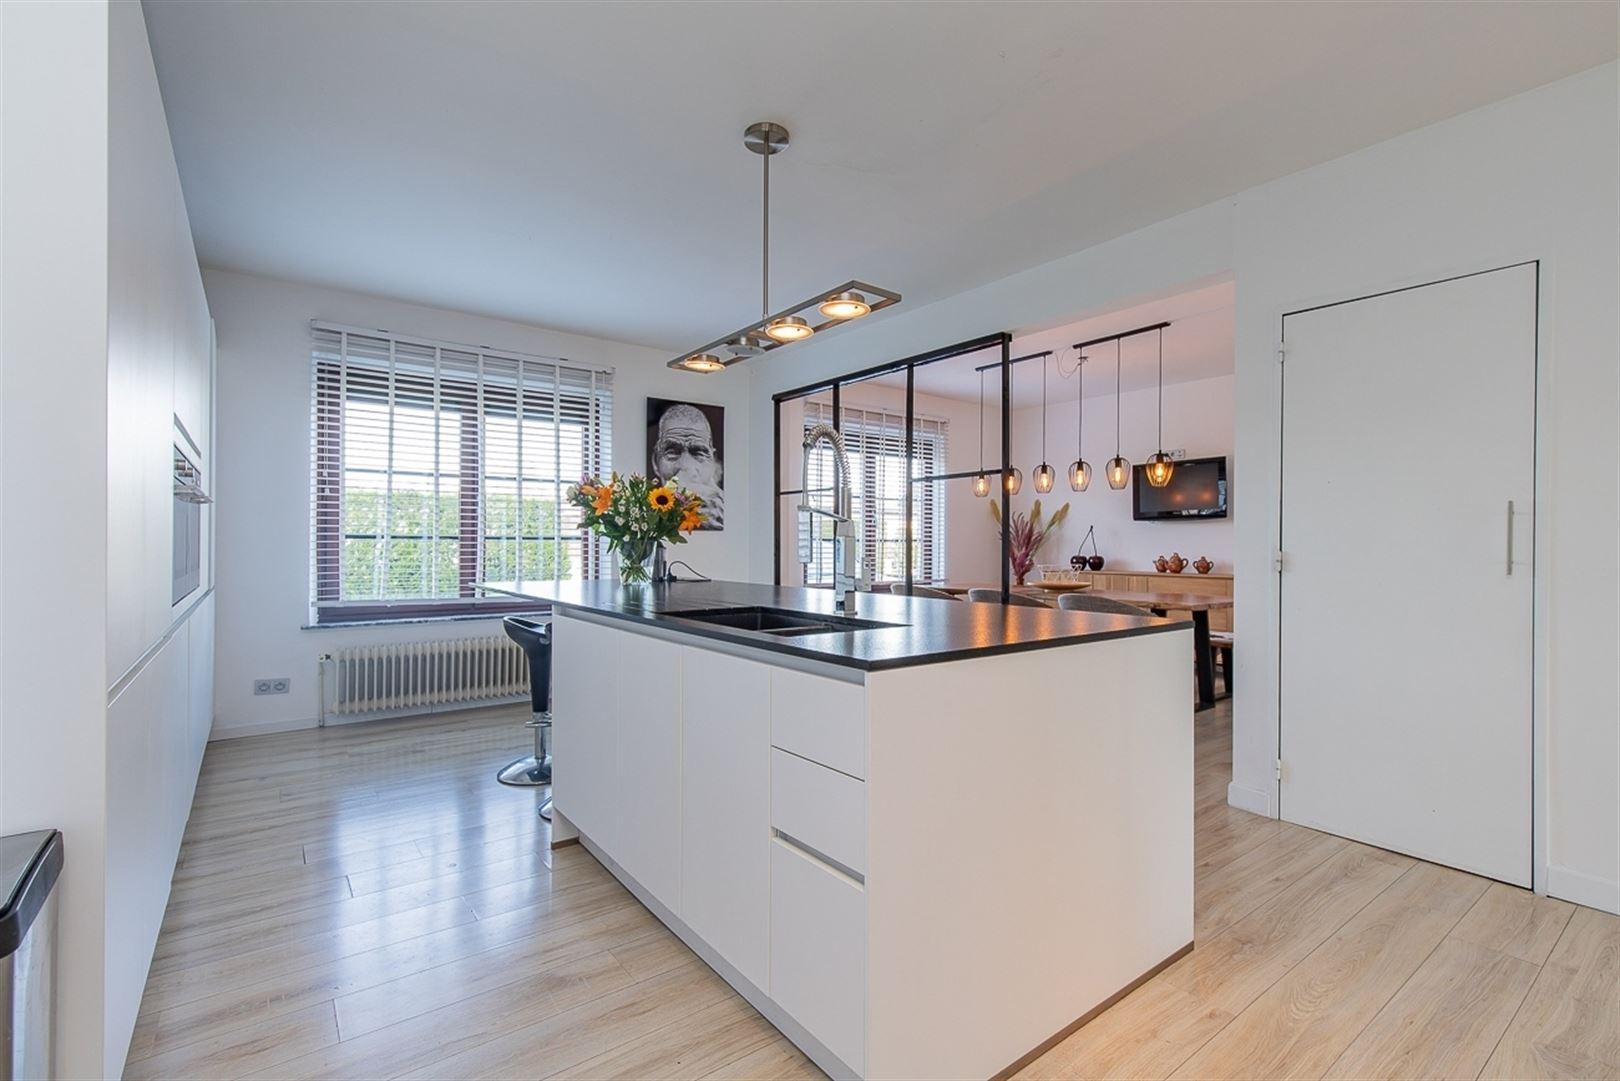 Foto 2 : Villa te 9100 SINT-NIKLAAS (België) - Prijs € 549.000